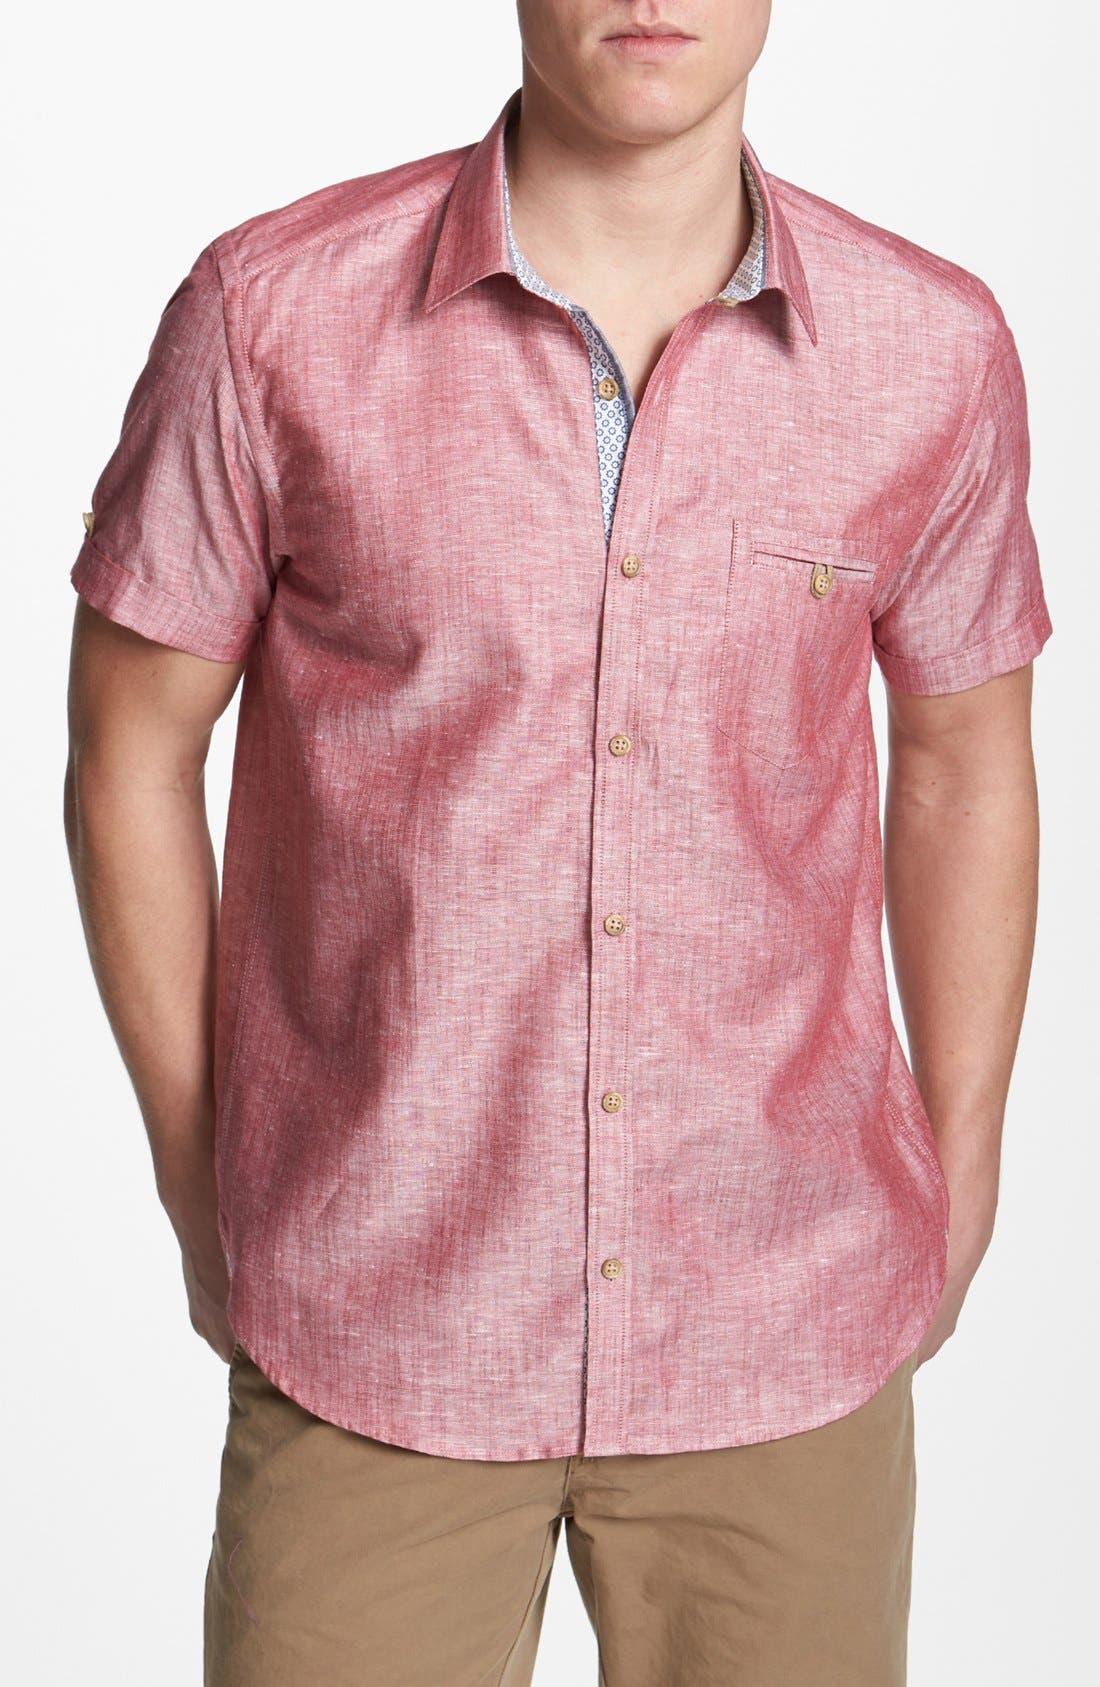 Alternate Image 1 Selected - Ted Baker London 'Mytime' Linen Blend Campshirt